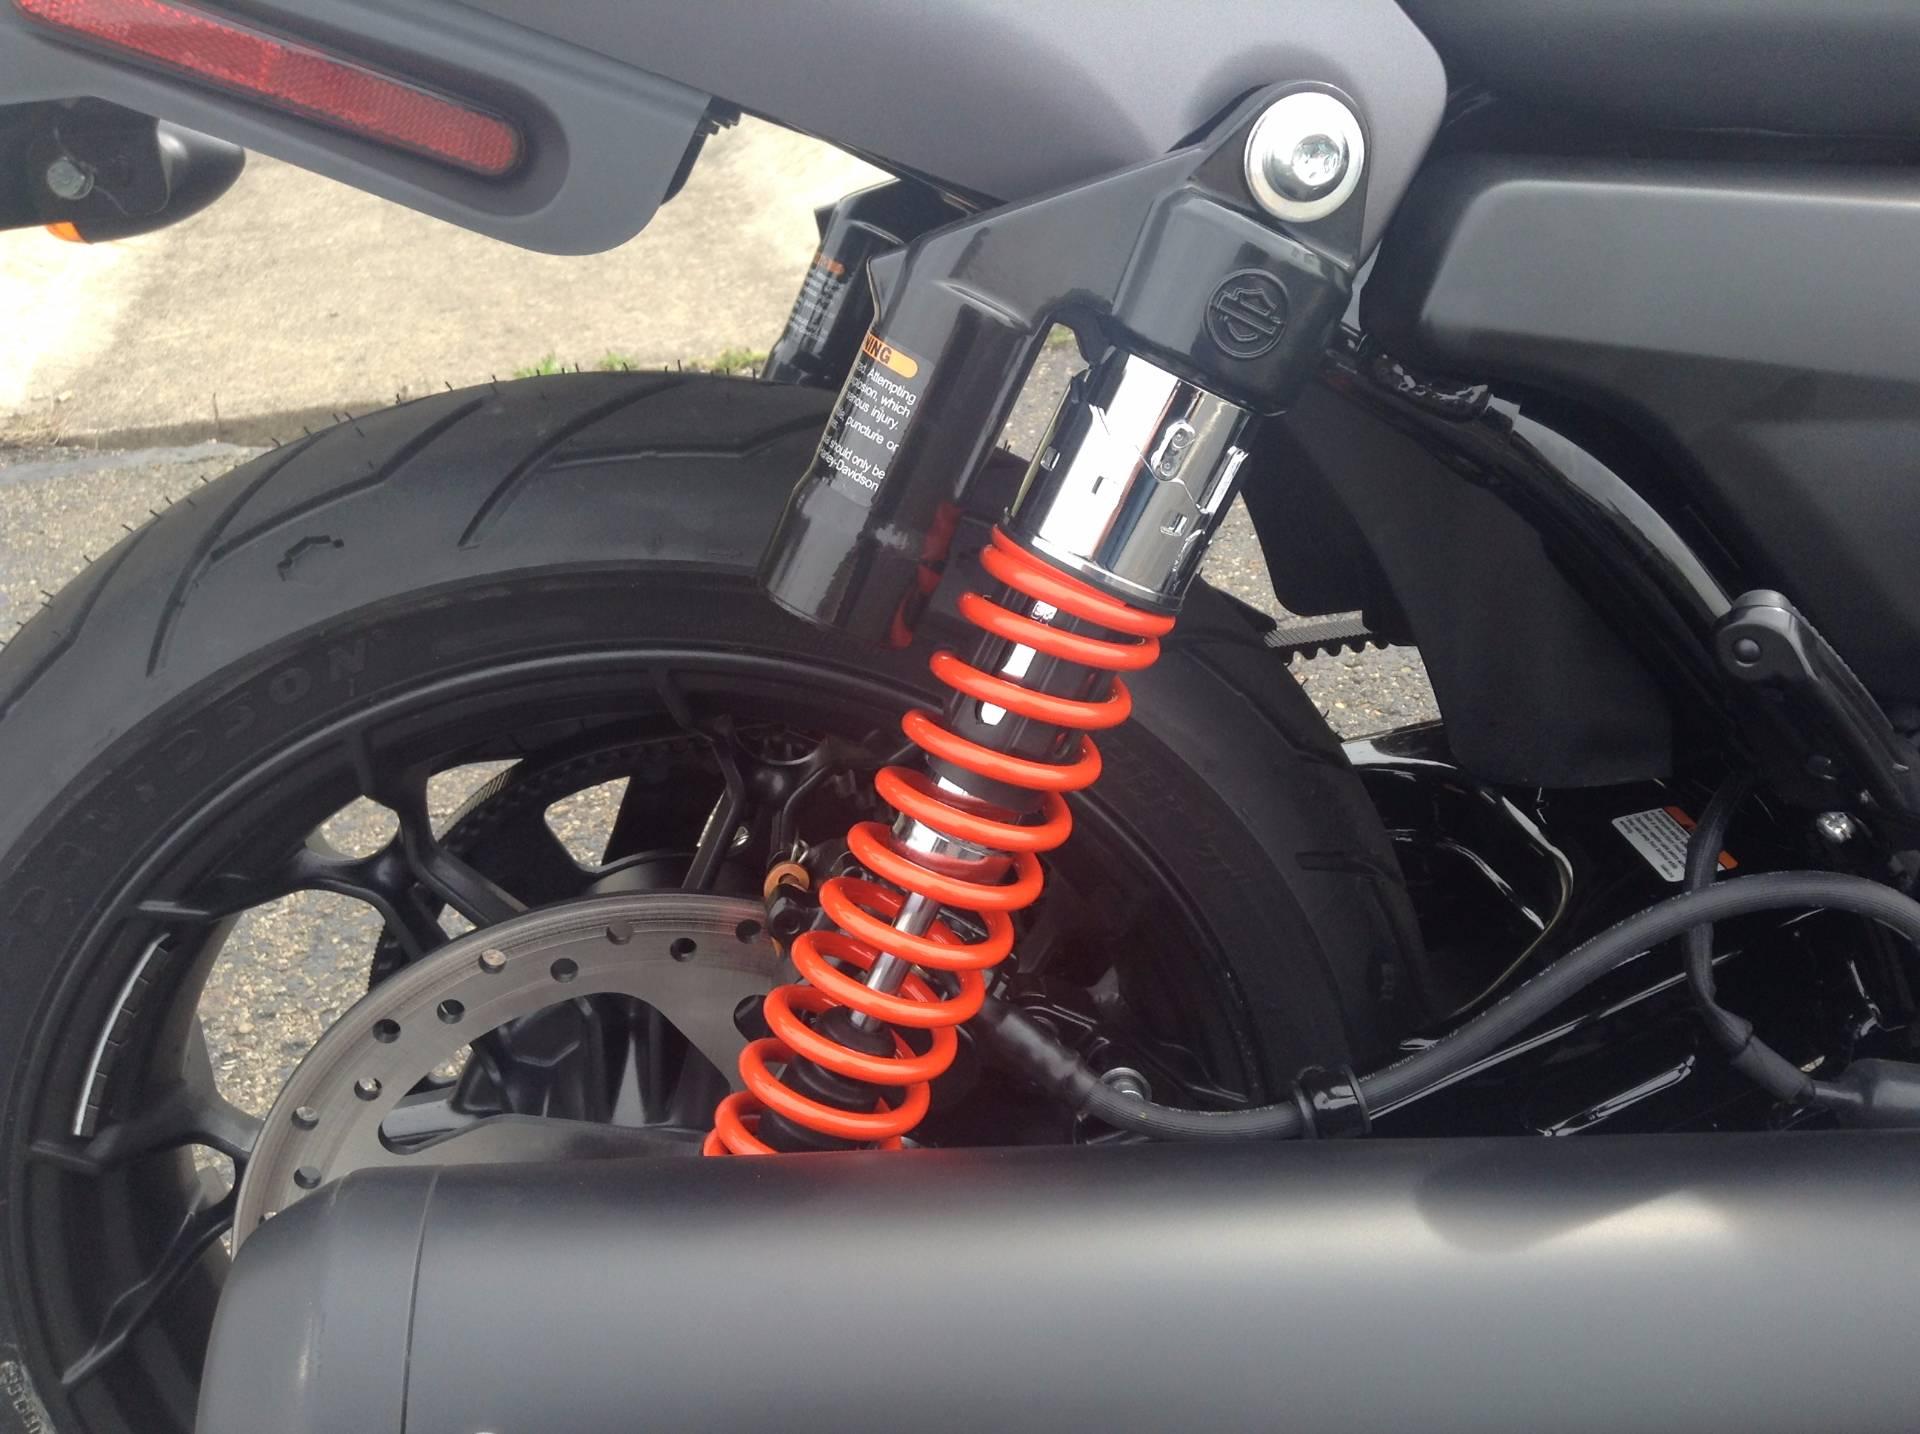 2017 Harley-Davidson Street™ Rod in Sunbury, Ohio